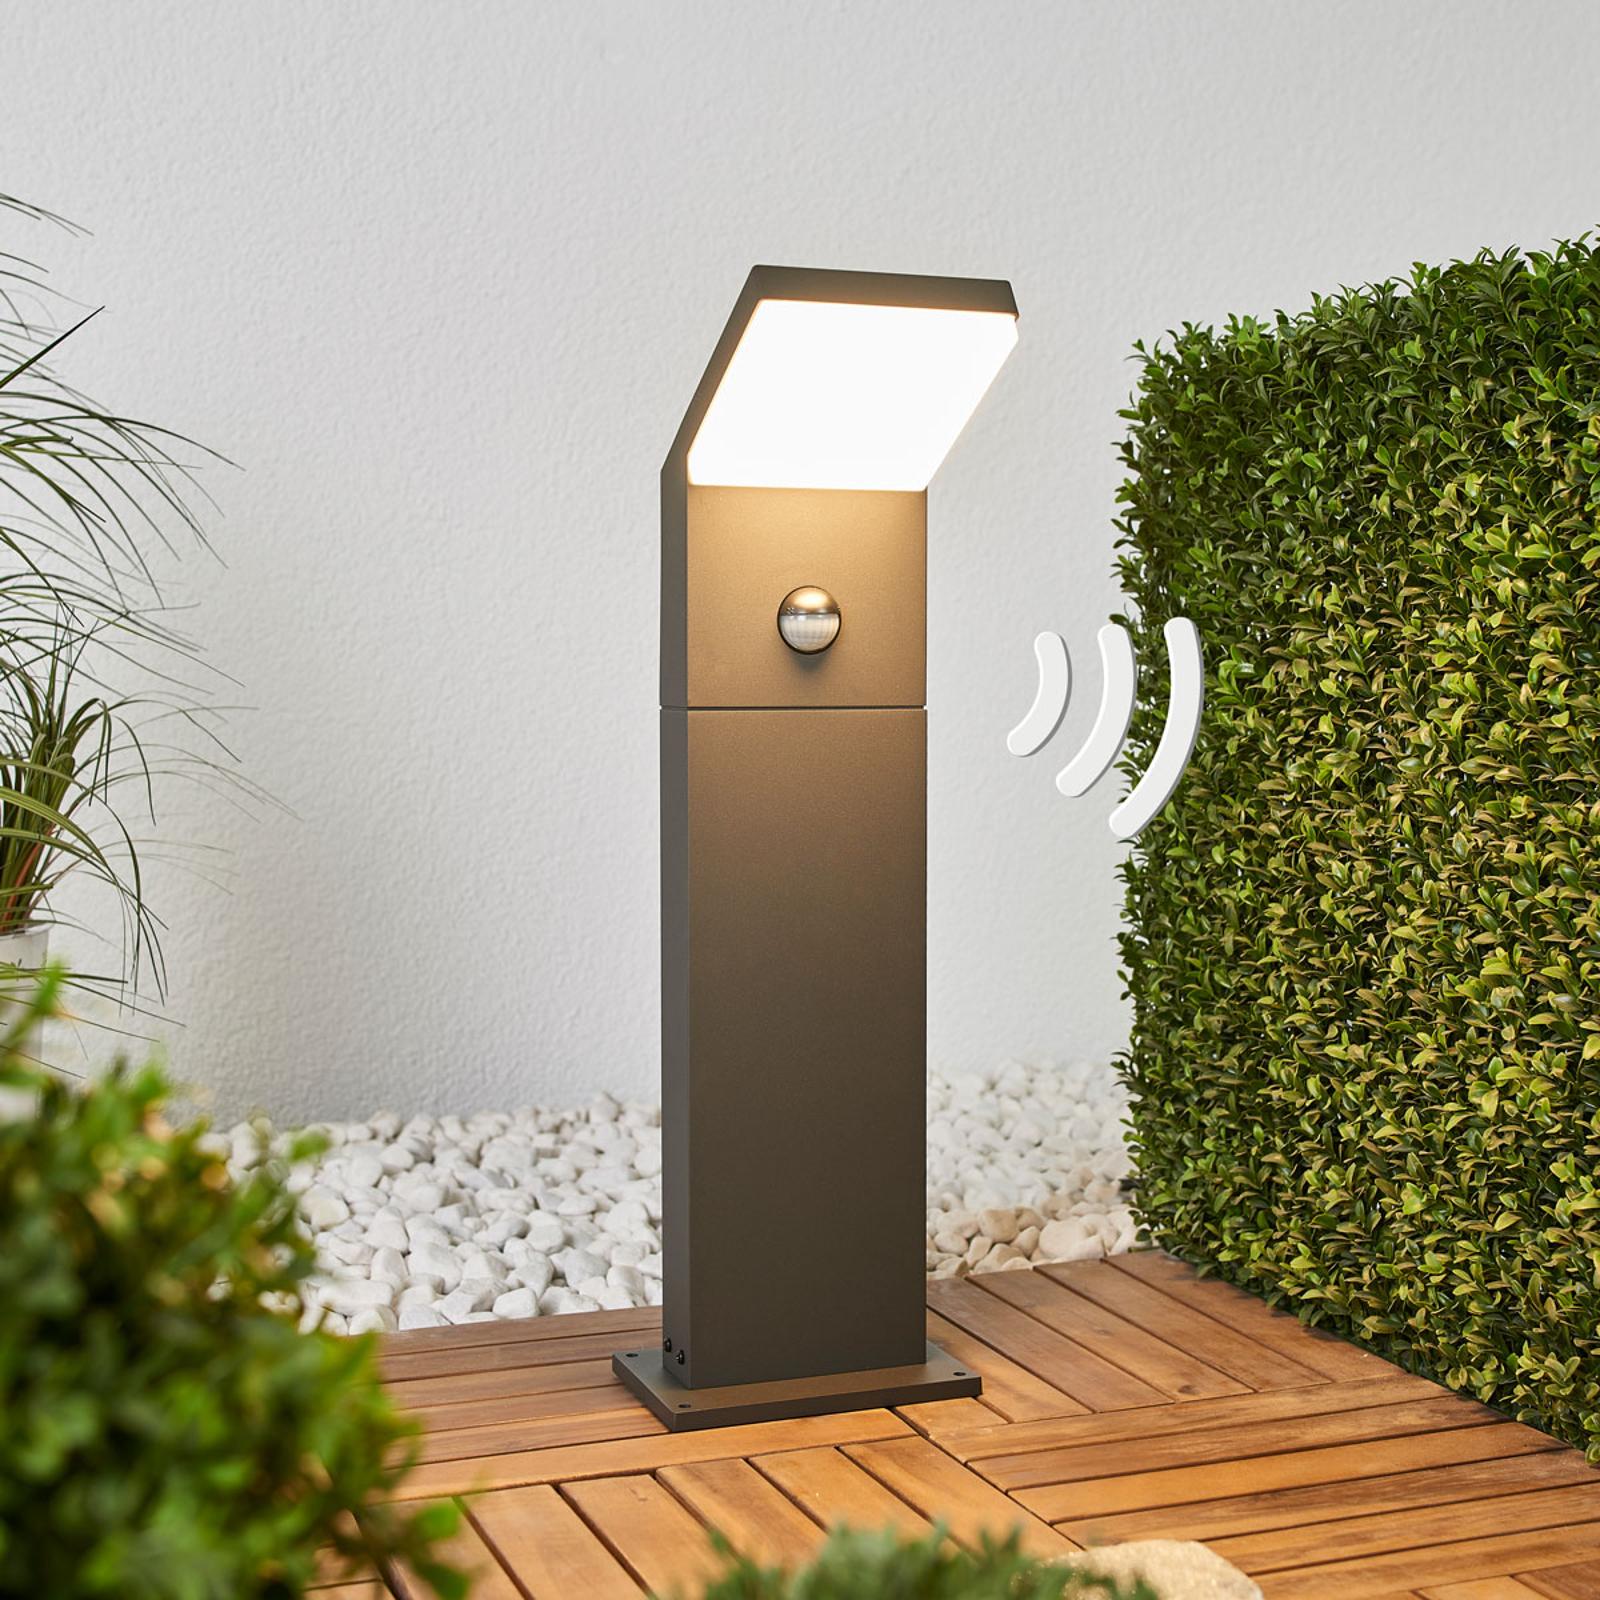 LED-pylväsvalaisin Yolena sensorilla, 60 cm